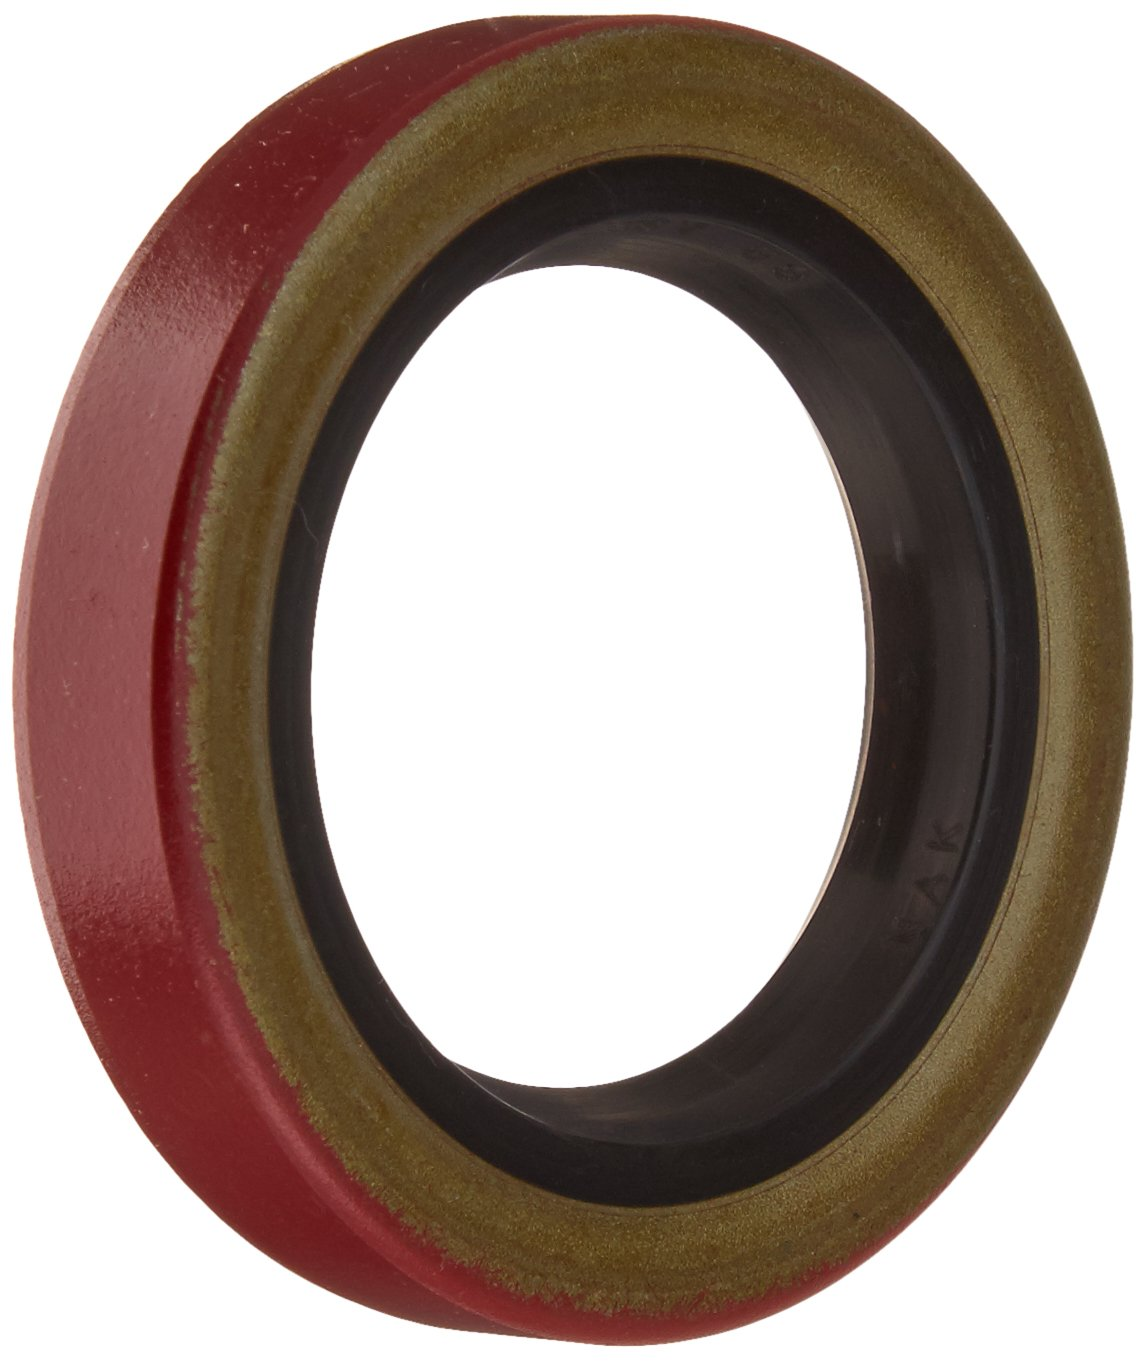 Timken 484054 Seal B00153XU08